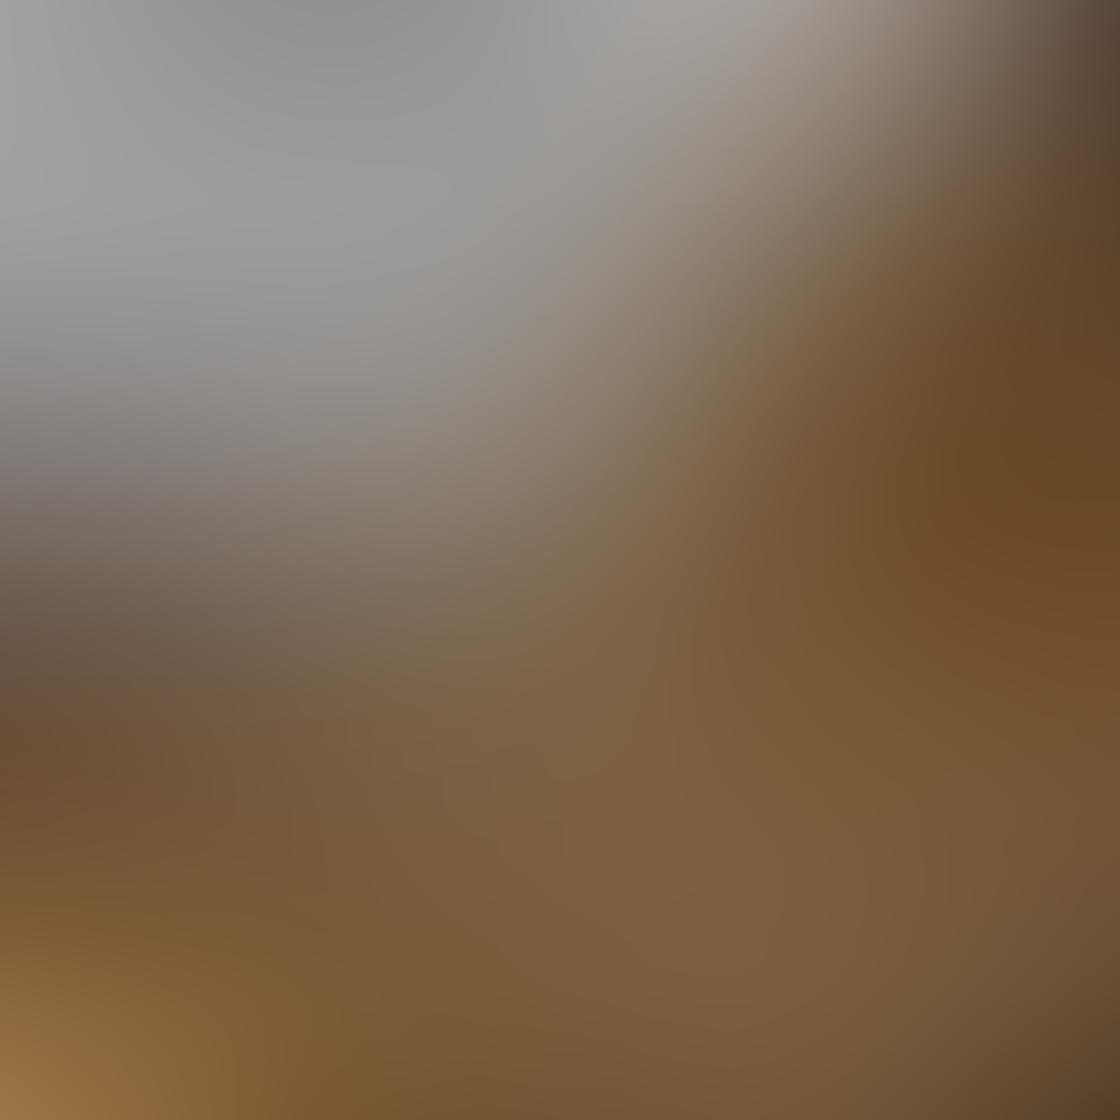 iPhone Angle Photo 26